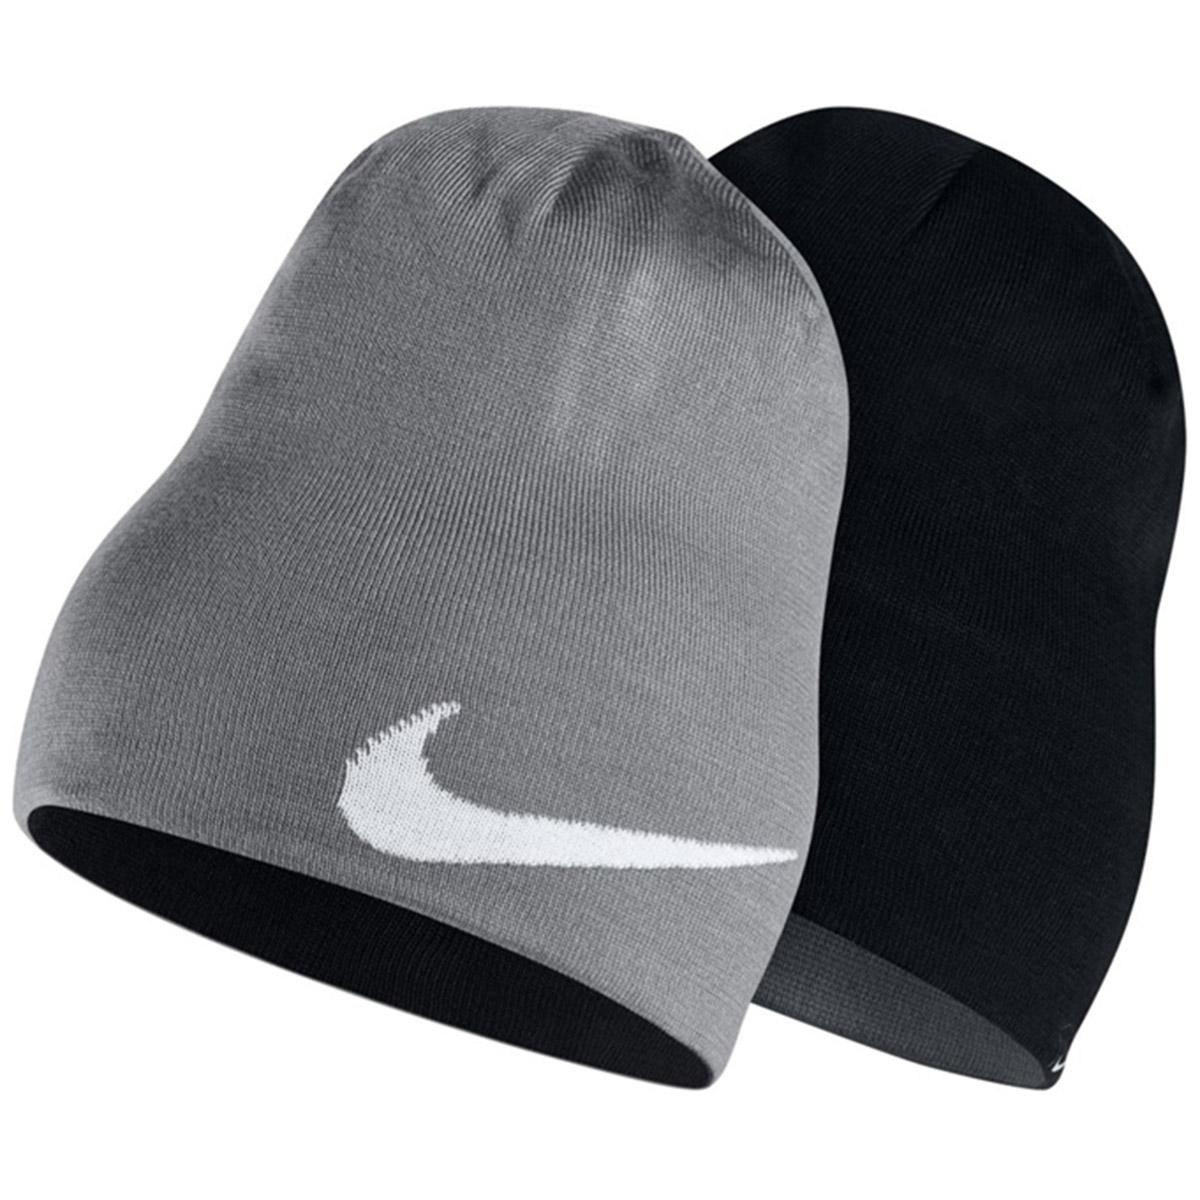 Nike Beanie Reversible W7 ... 0d4b201478b